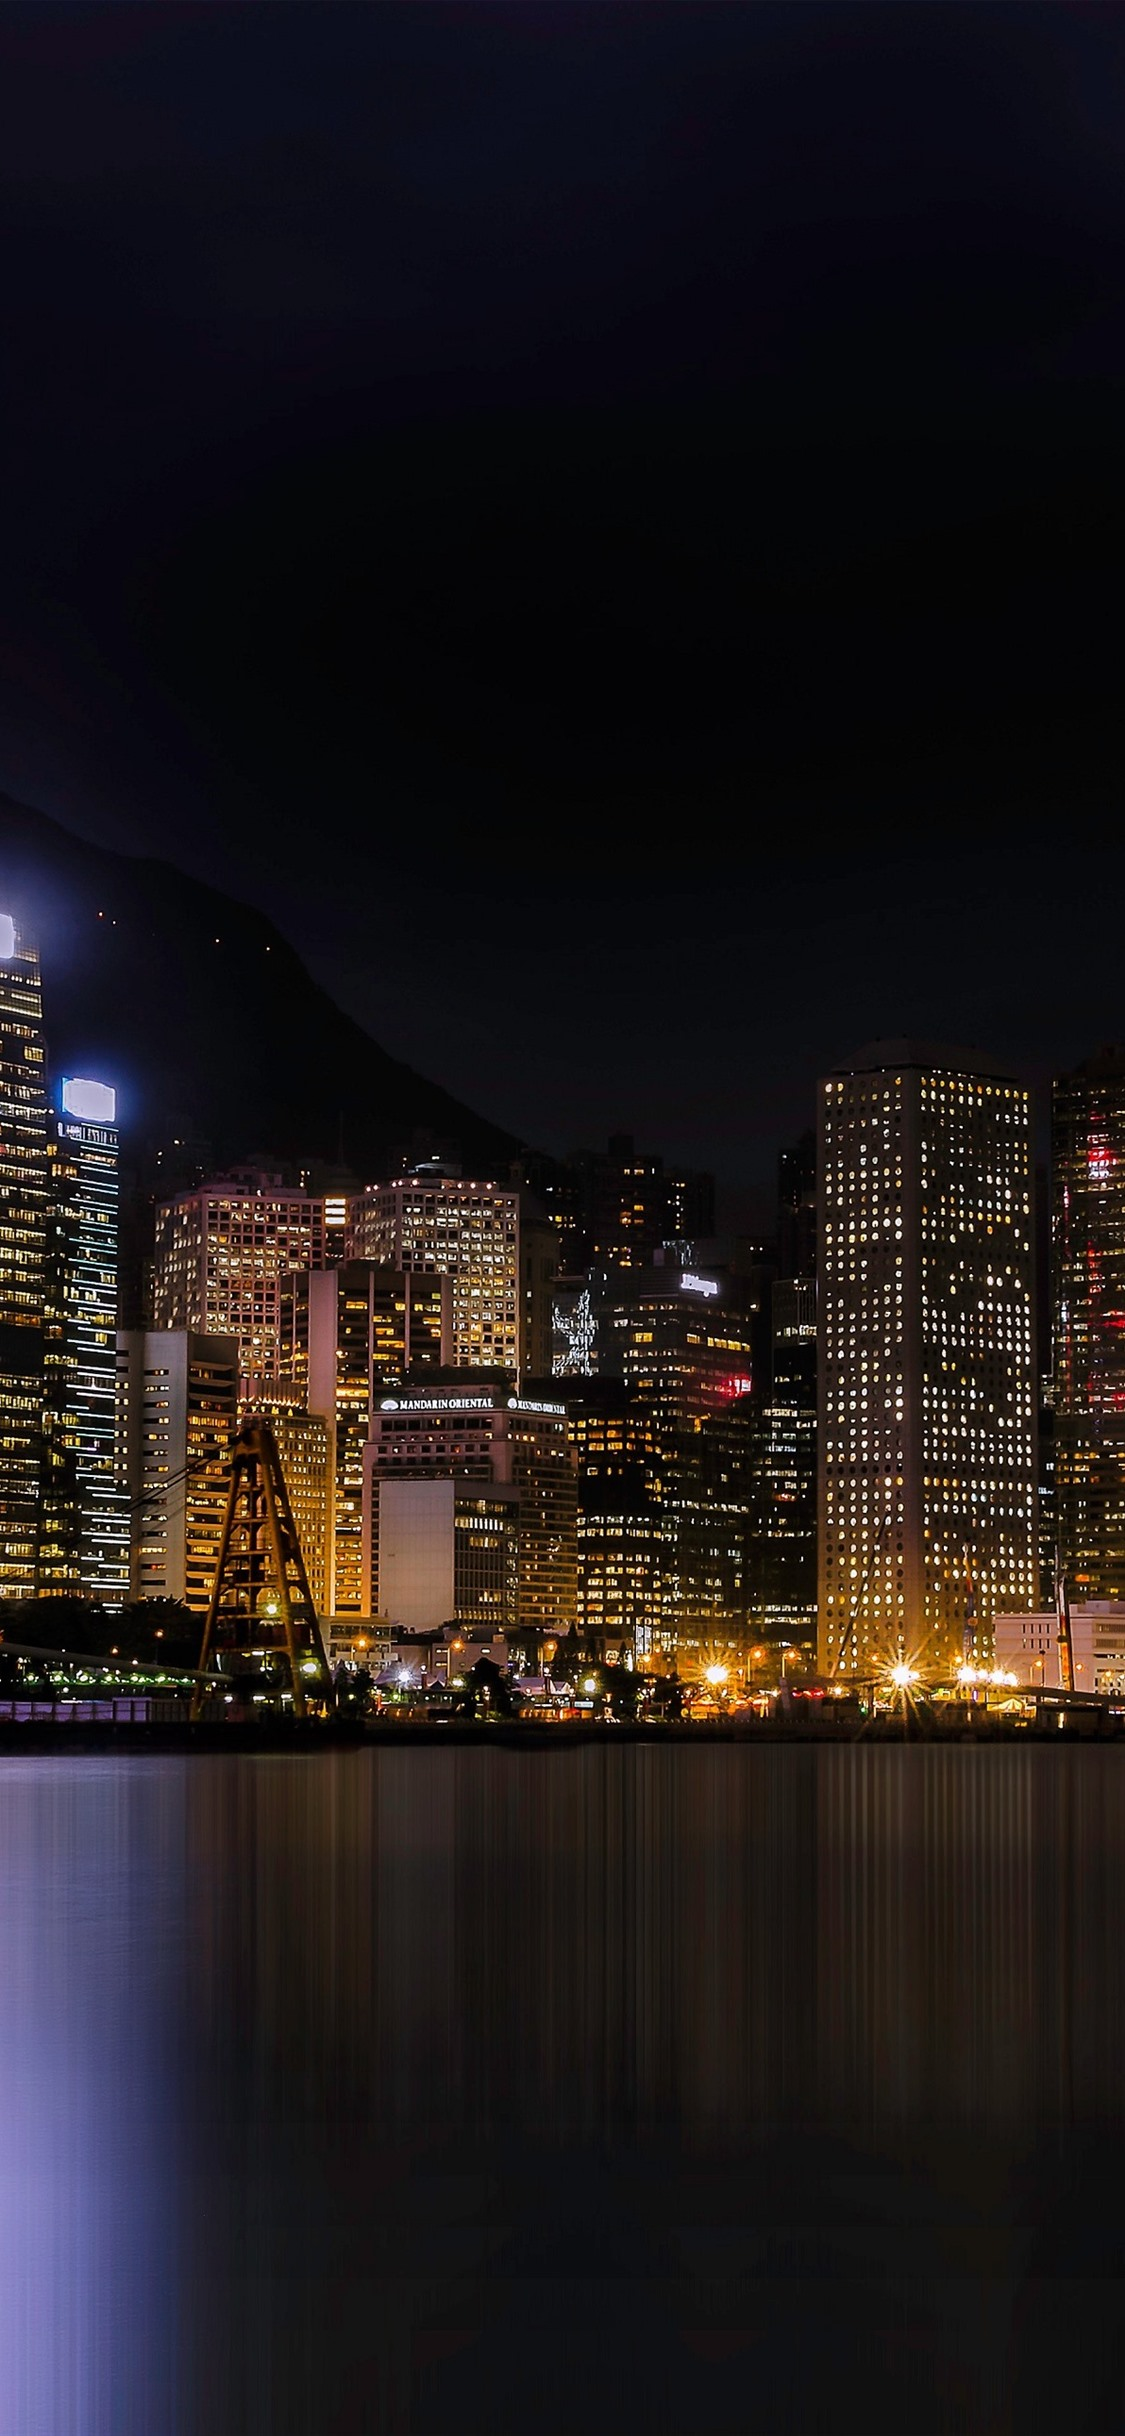 City Night Skyscrapers Lights Sea Hong Kong 1125x2436